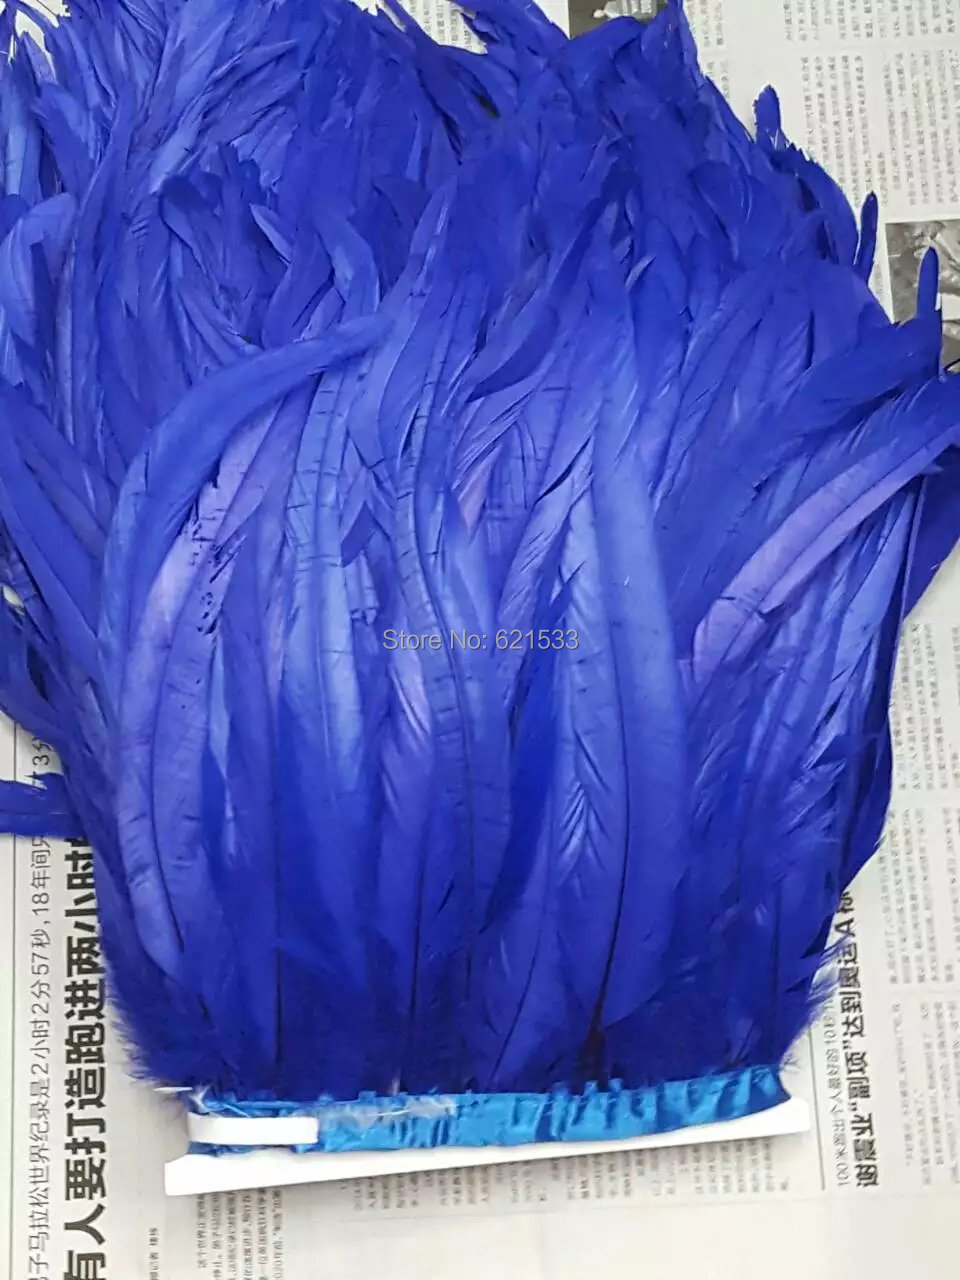 3dbe32409 الديك/كوكه tail الريشة هامش الملكي الأزرق اللون 10 متر تريم تقريبا 30-35  سنتيمتر في العرض